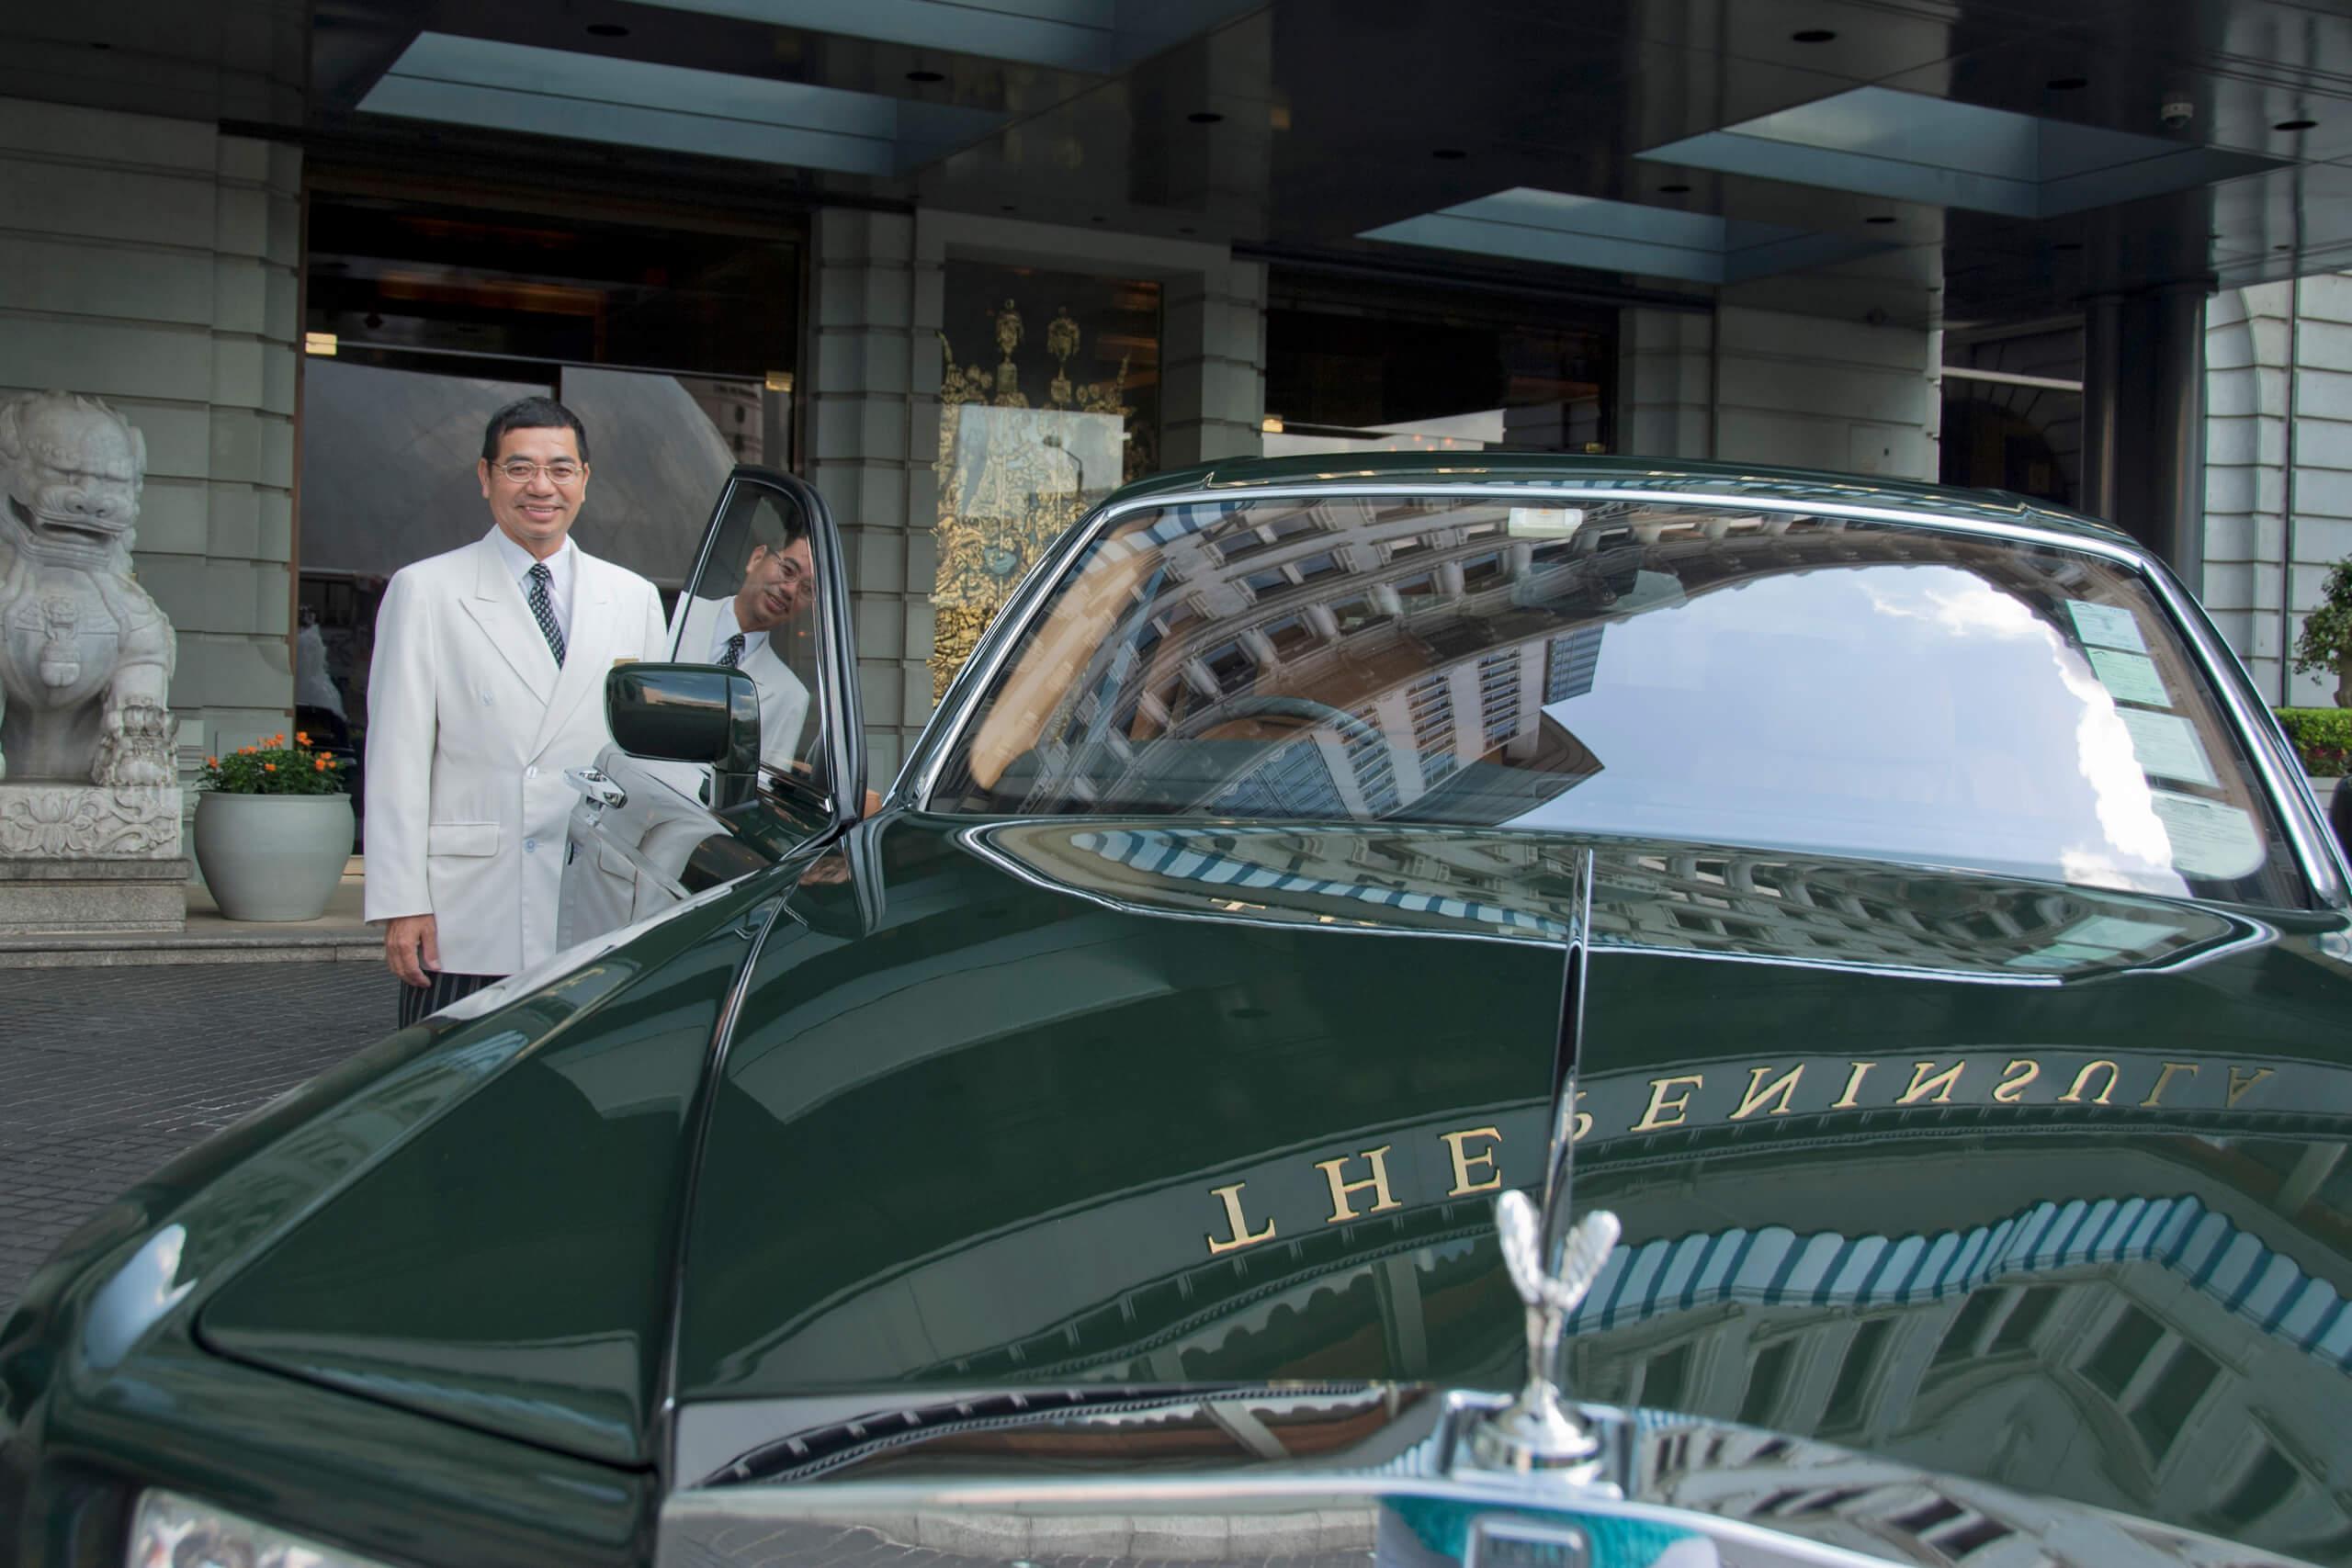 Peninsula Hotel Hong Kong, by Michelle Chaplow